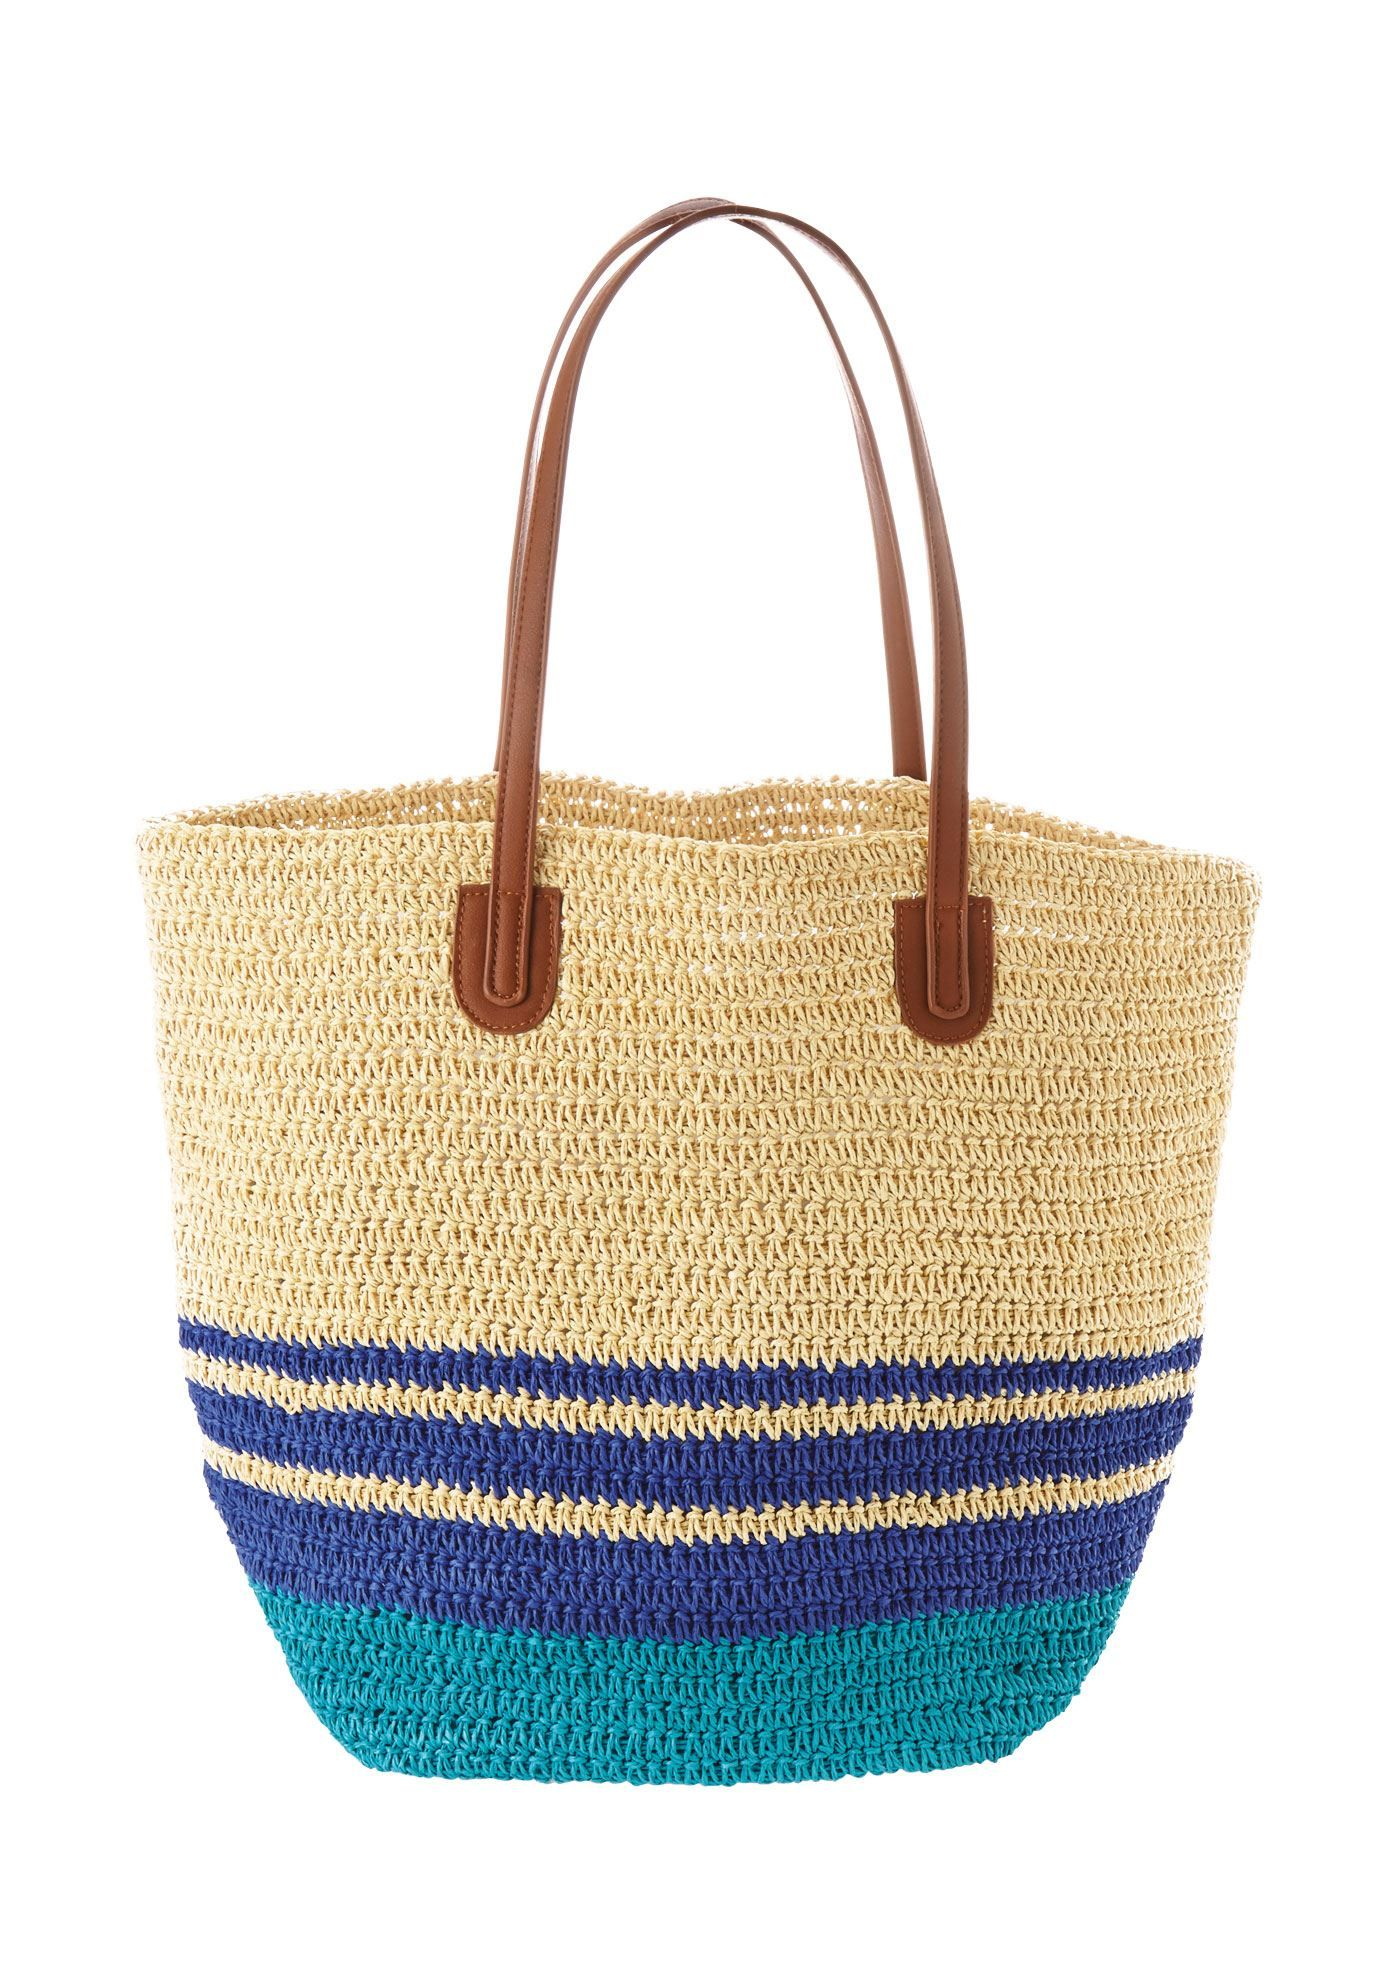 Straw beach bag - Wide Width Women s  e0e9549f3